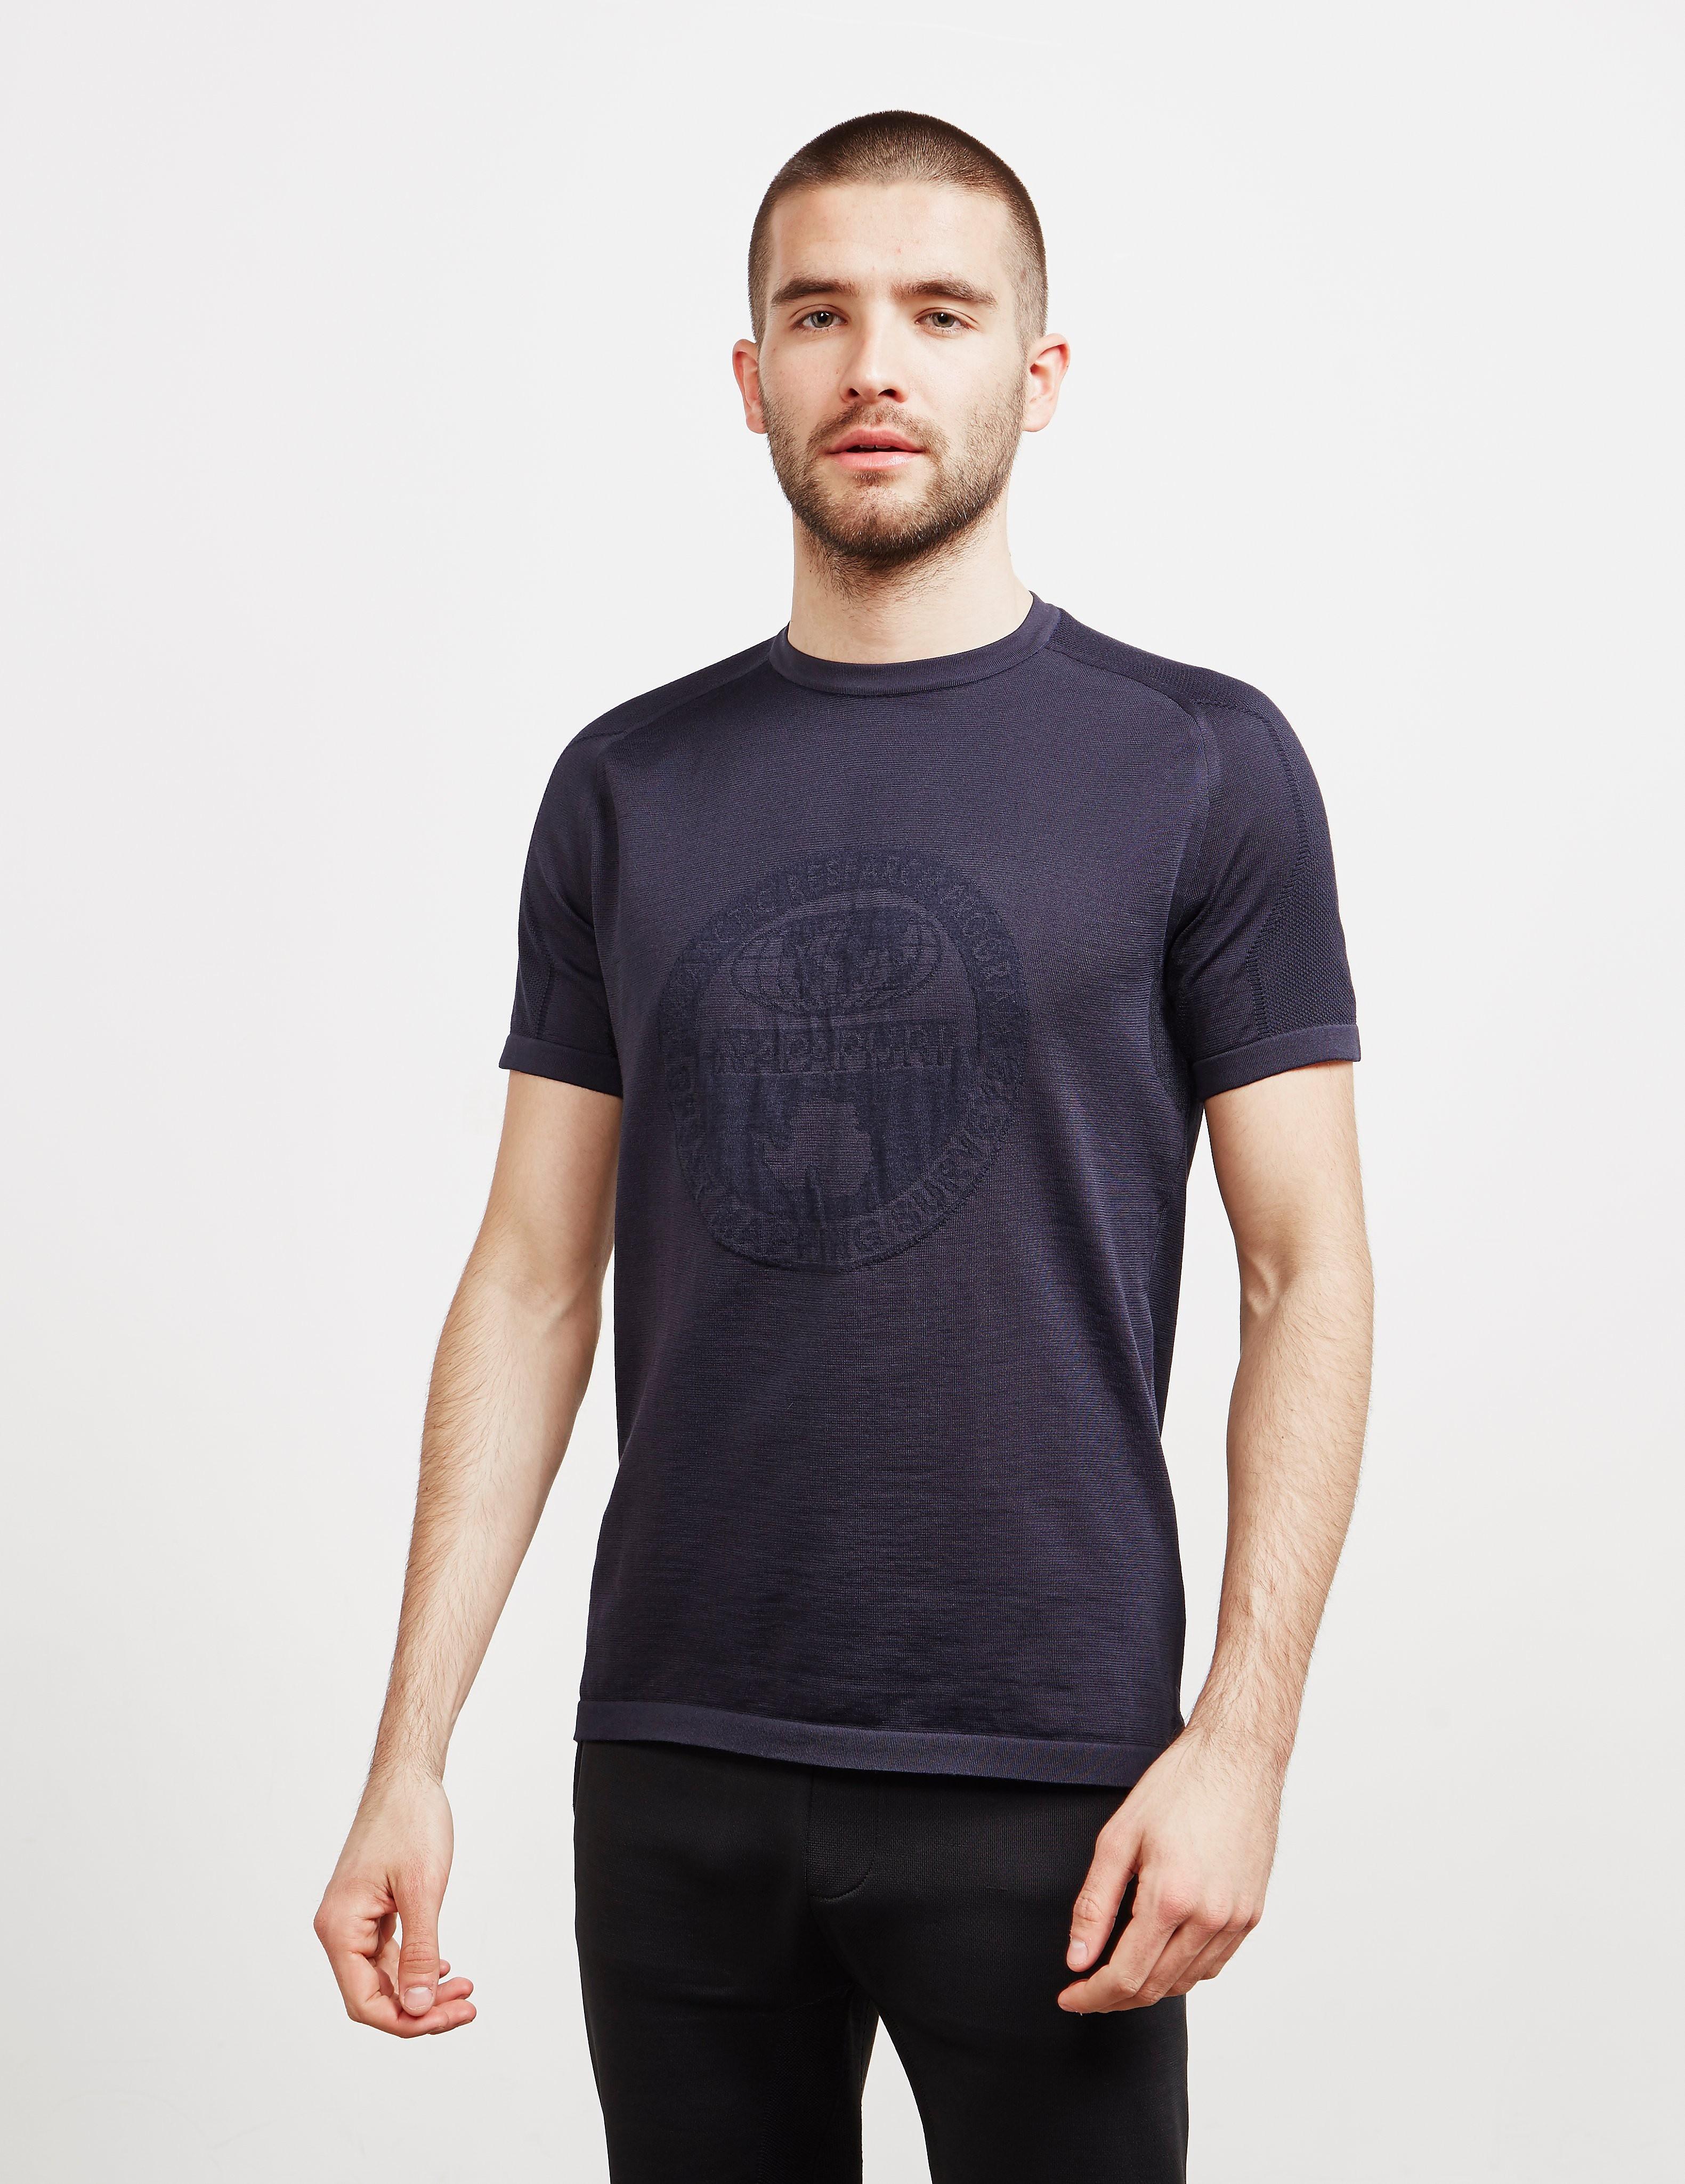 Napapijri Logo Short Sleeve T-Shirt